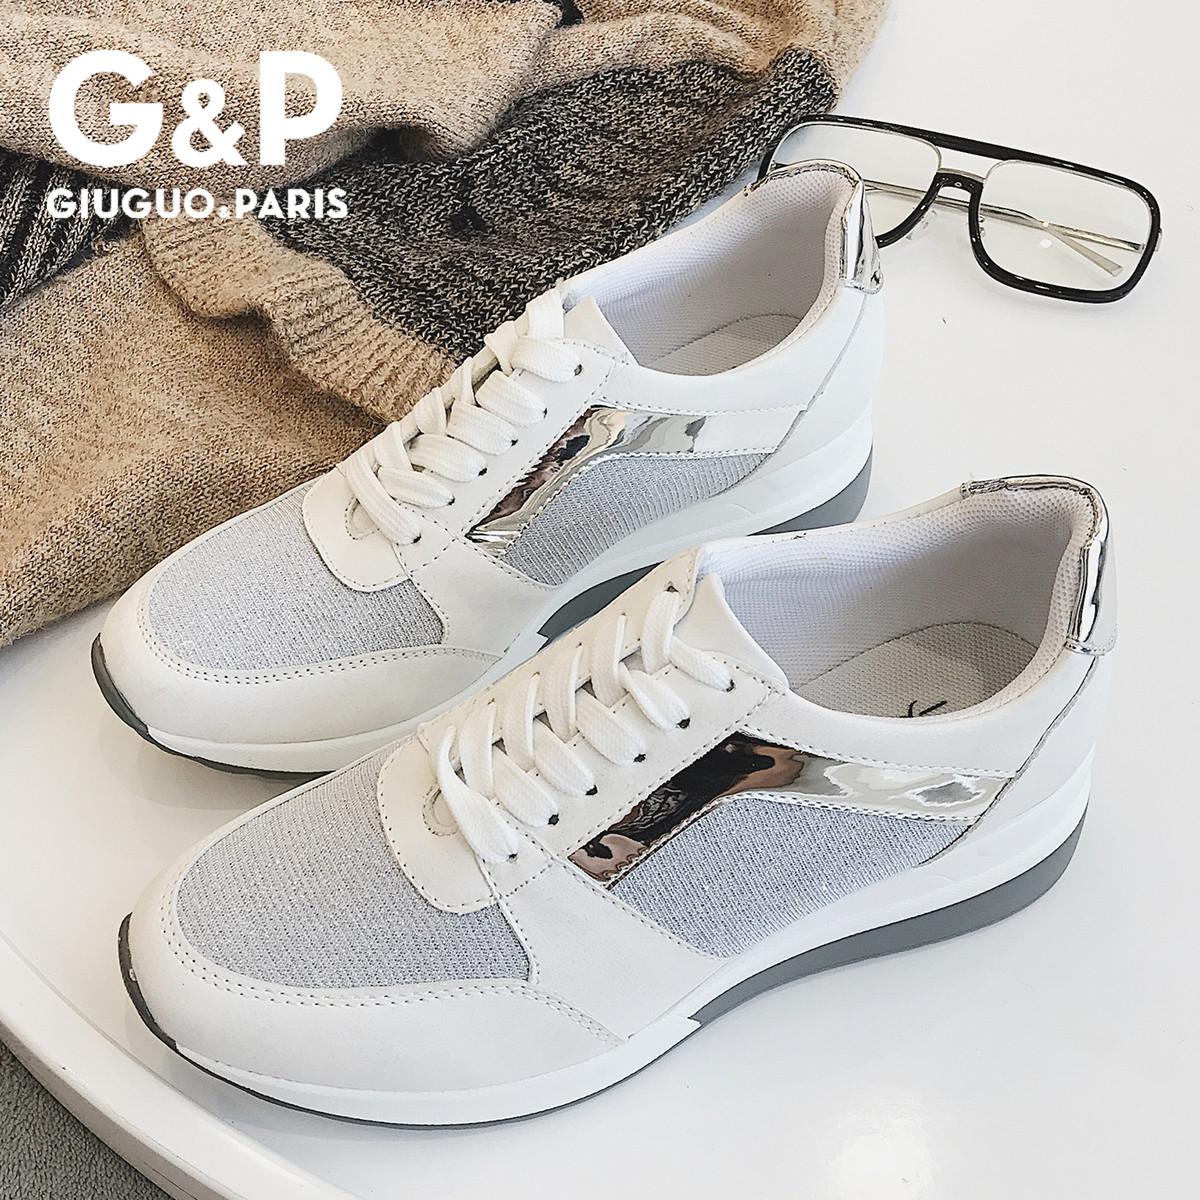 Wholesale Ladies Shoes Factory - Buy